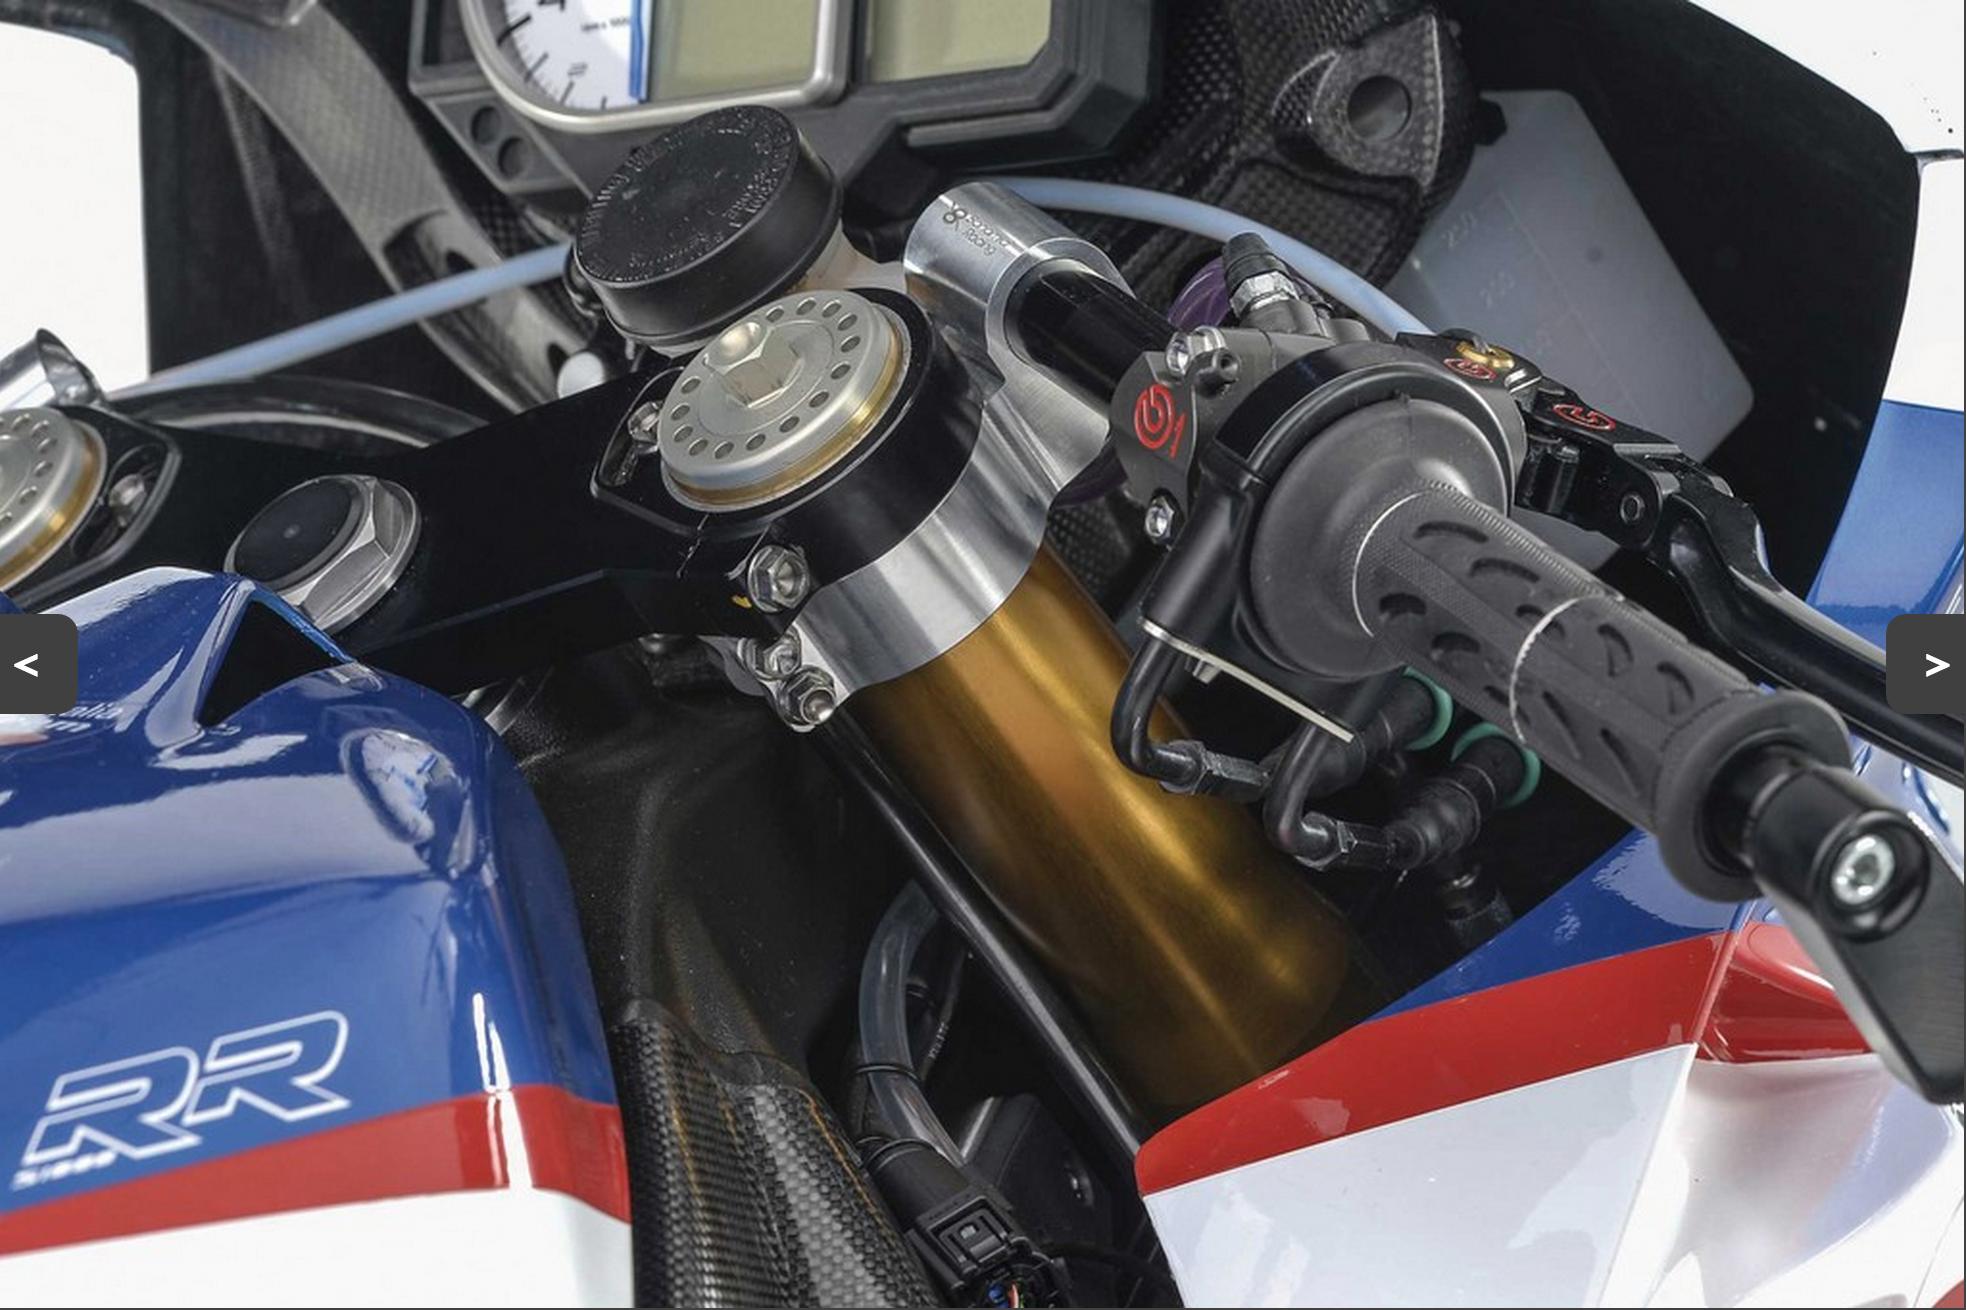 57mm Bonamici Ducati Panigale Clip-Ons